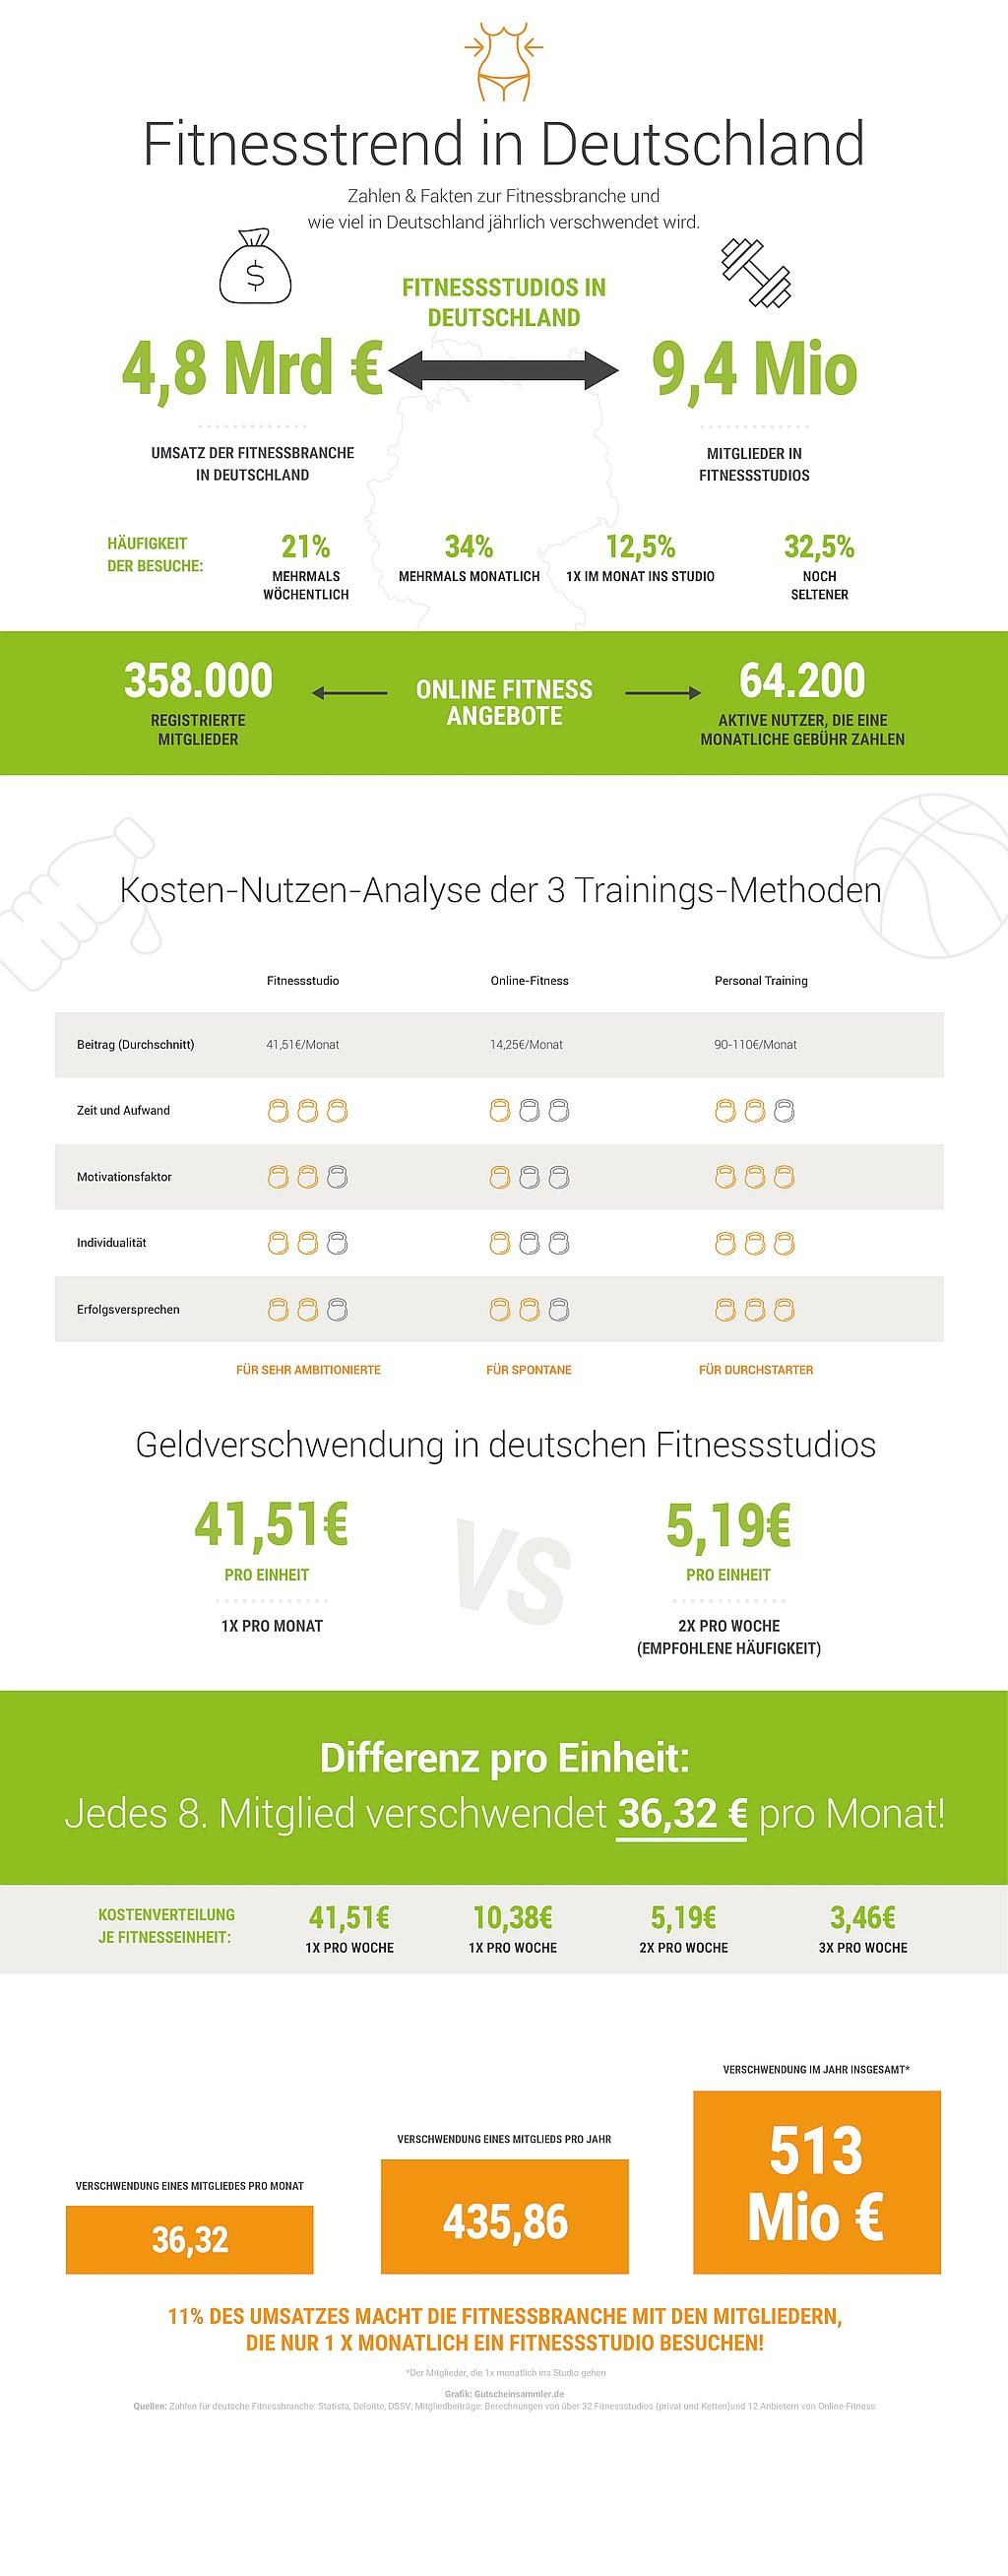 infografik gutscheinde verschwendung fitnessbranche